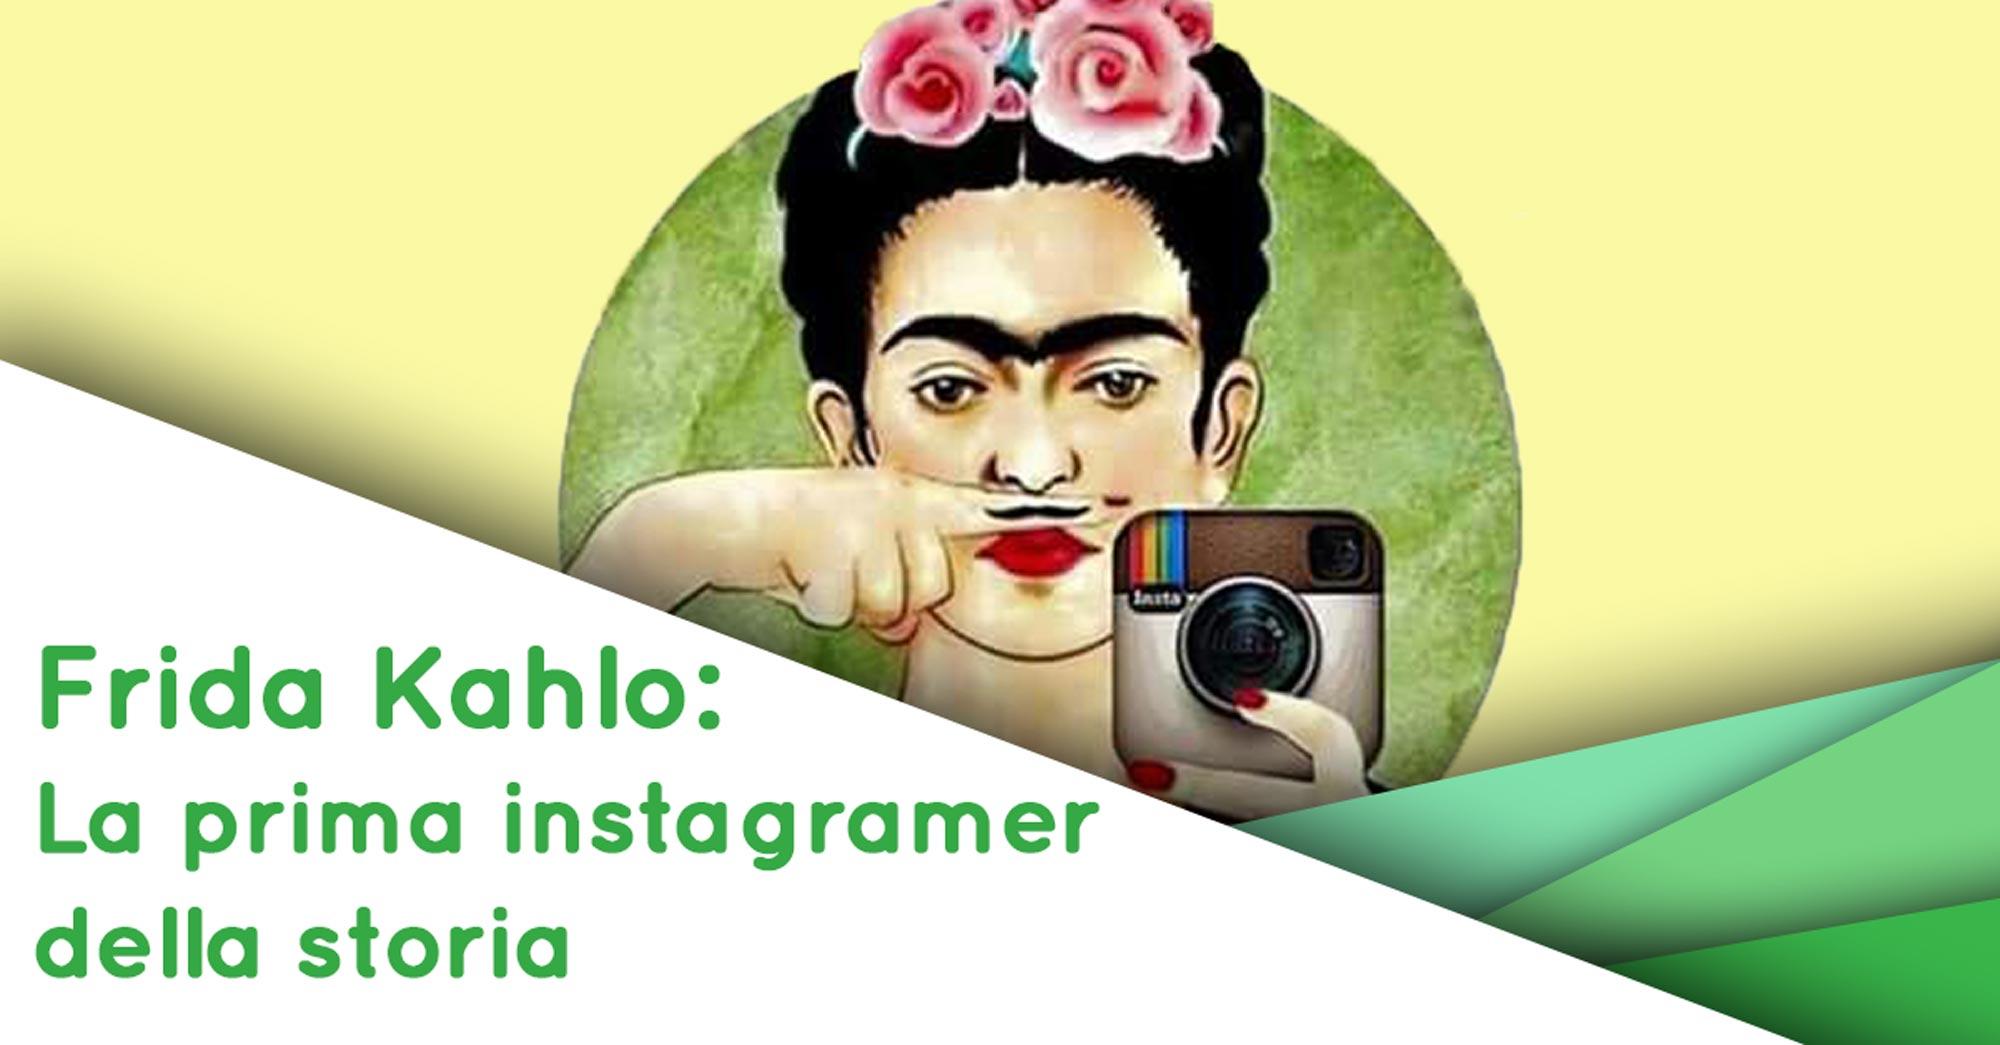 Frida Kahlo Instagramer